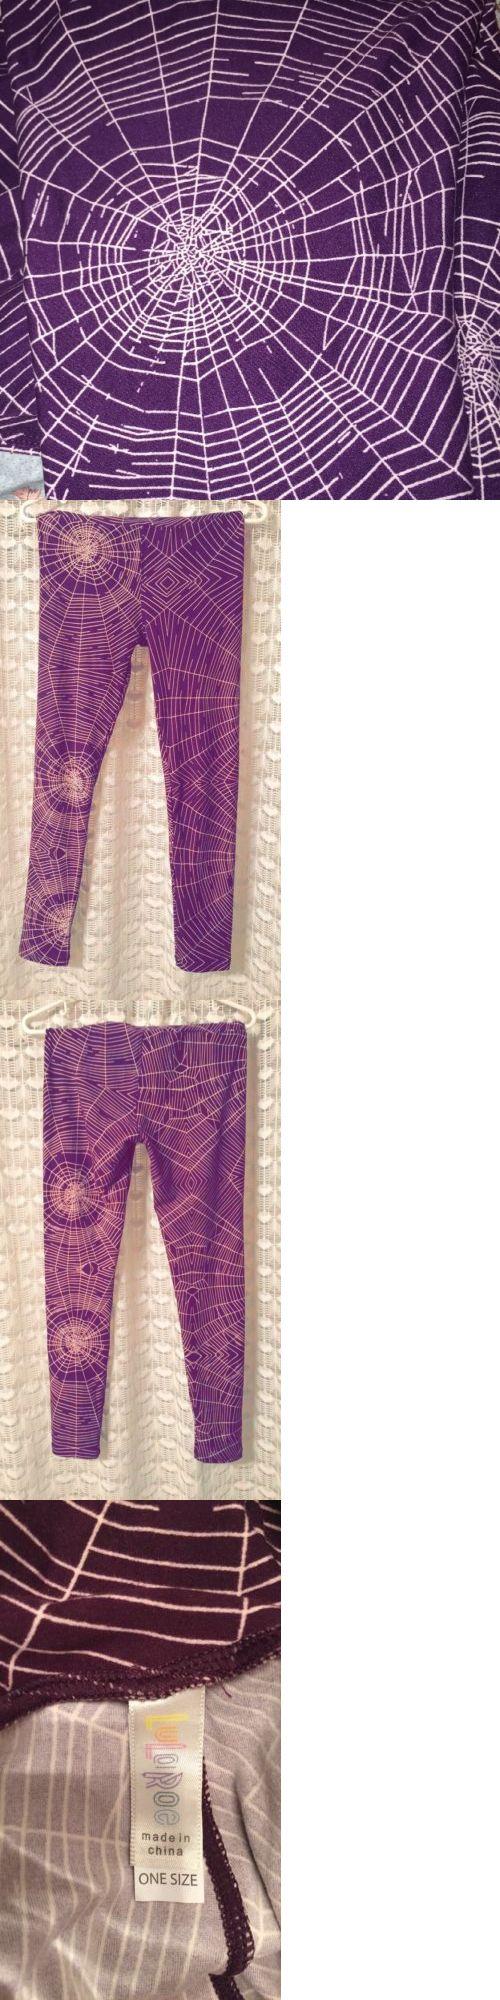 Women Leggings: **New** Lularoe Leggings - Os - Purple White Spider Web Halloween - Unicorn! -> BUY IT NOW ONLY: $99.99 on eBay!